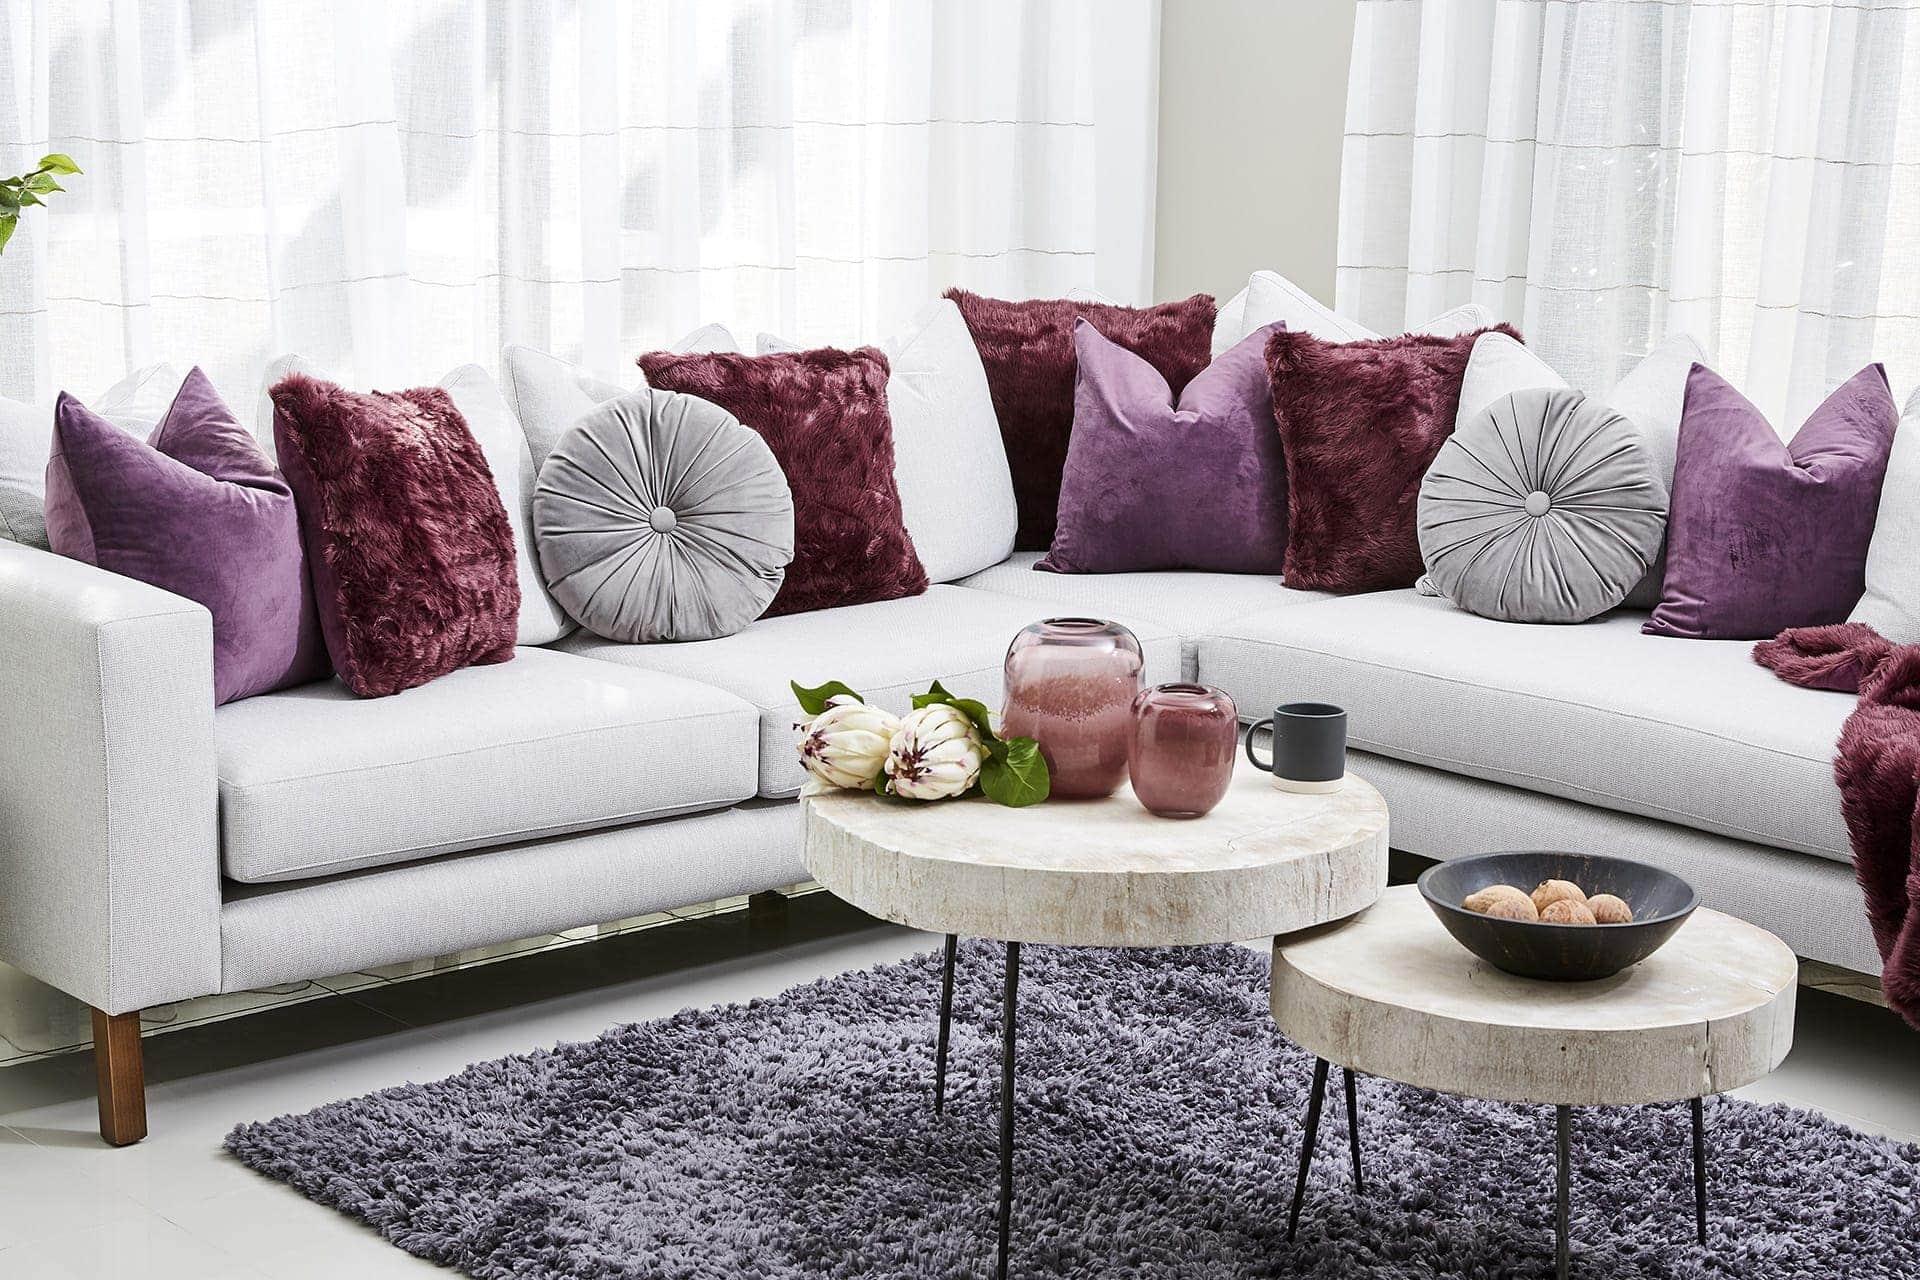 purple and grey sofa styling ideas lorraine lea cushions